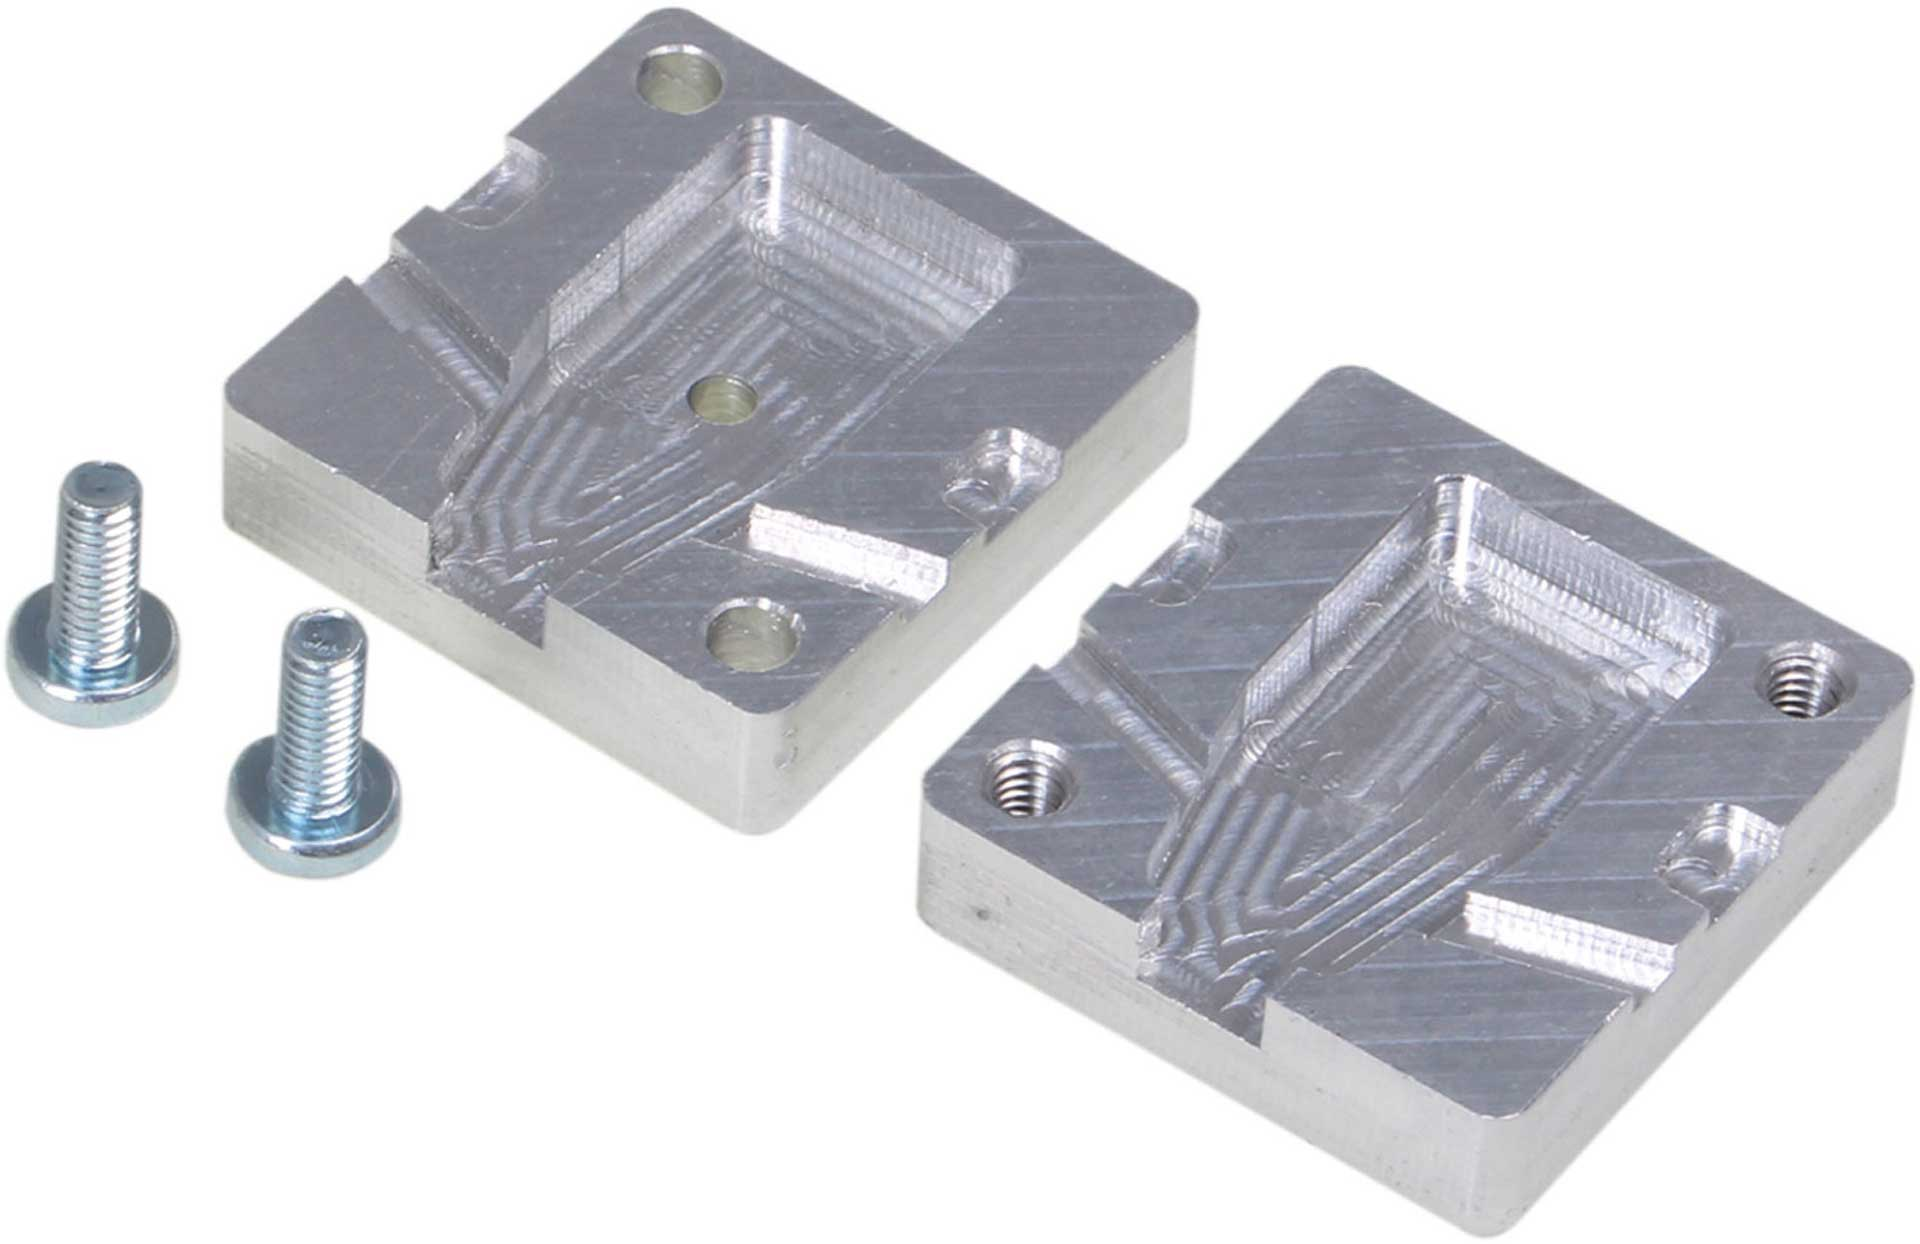 ROBBE CNC GIEßFORM ALU MPX STECKER 6-POL